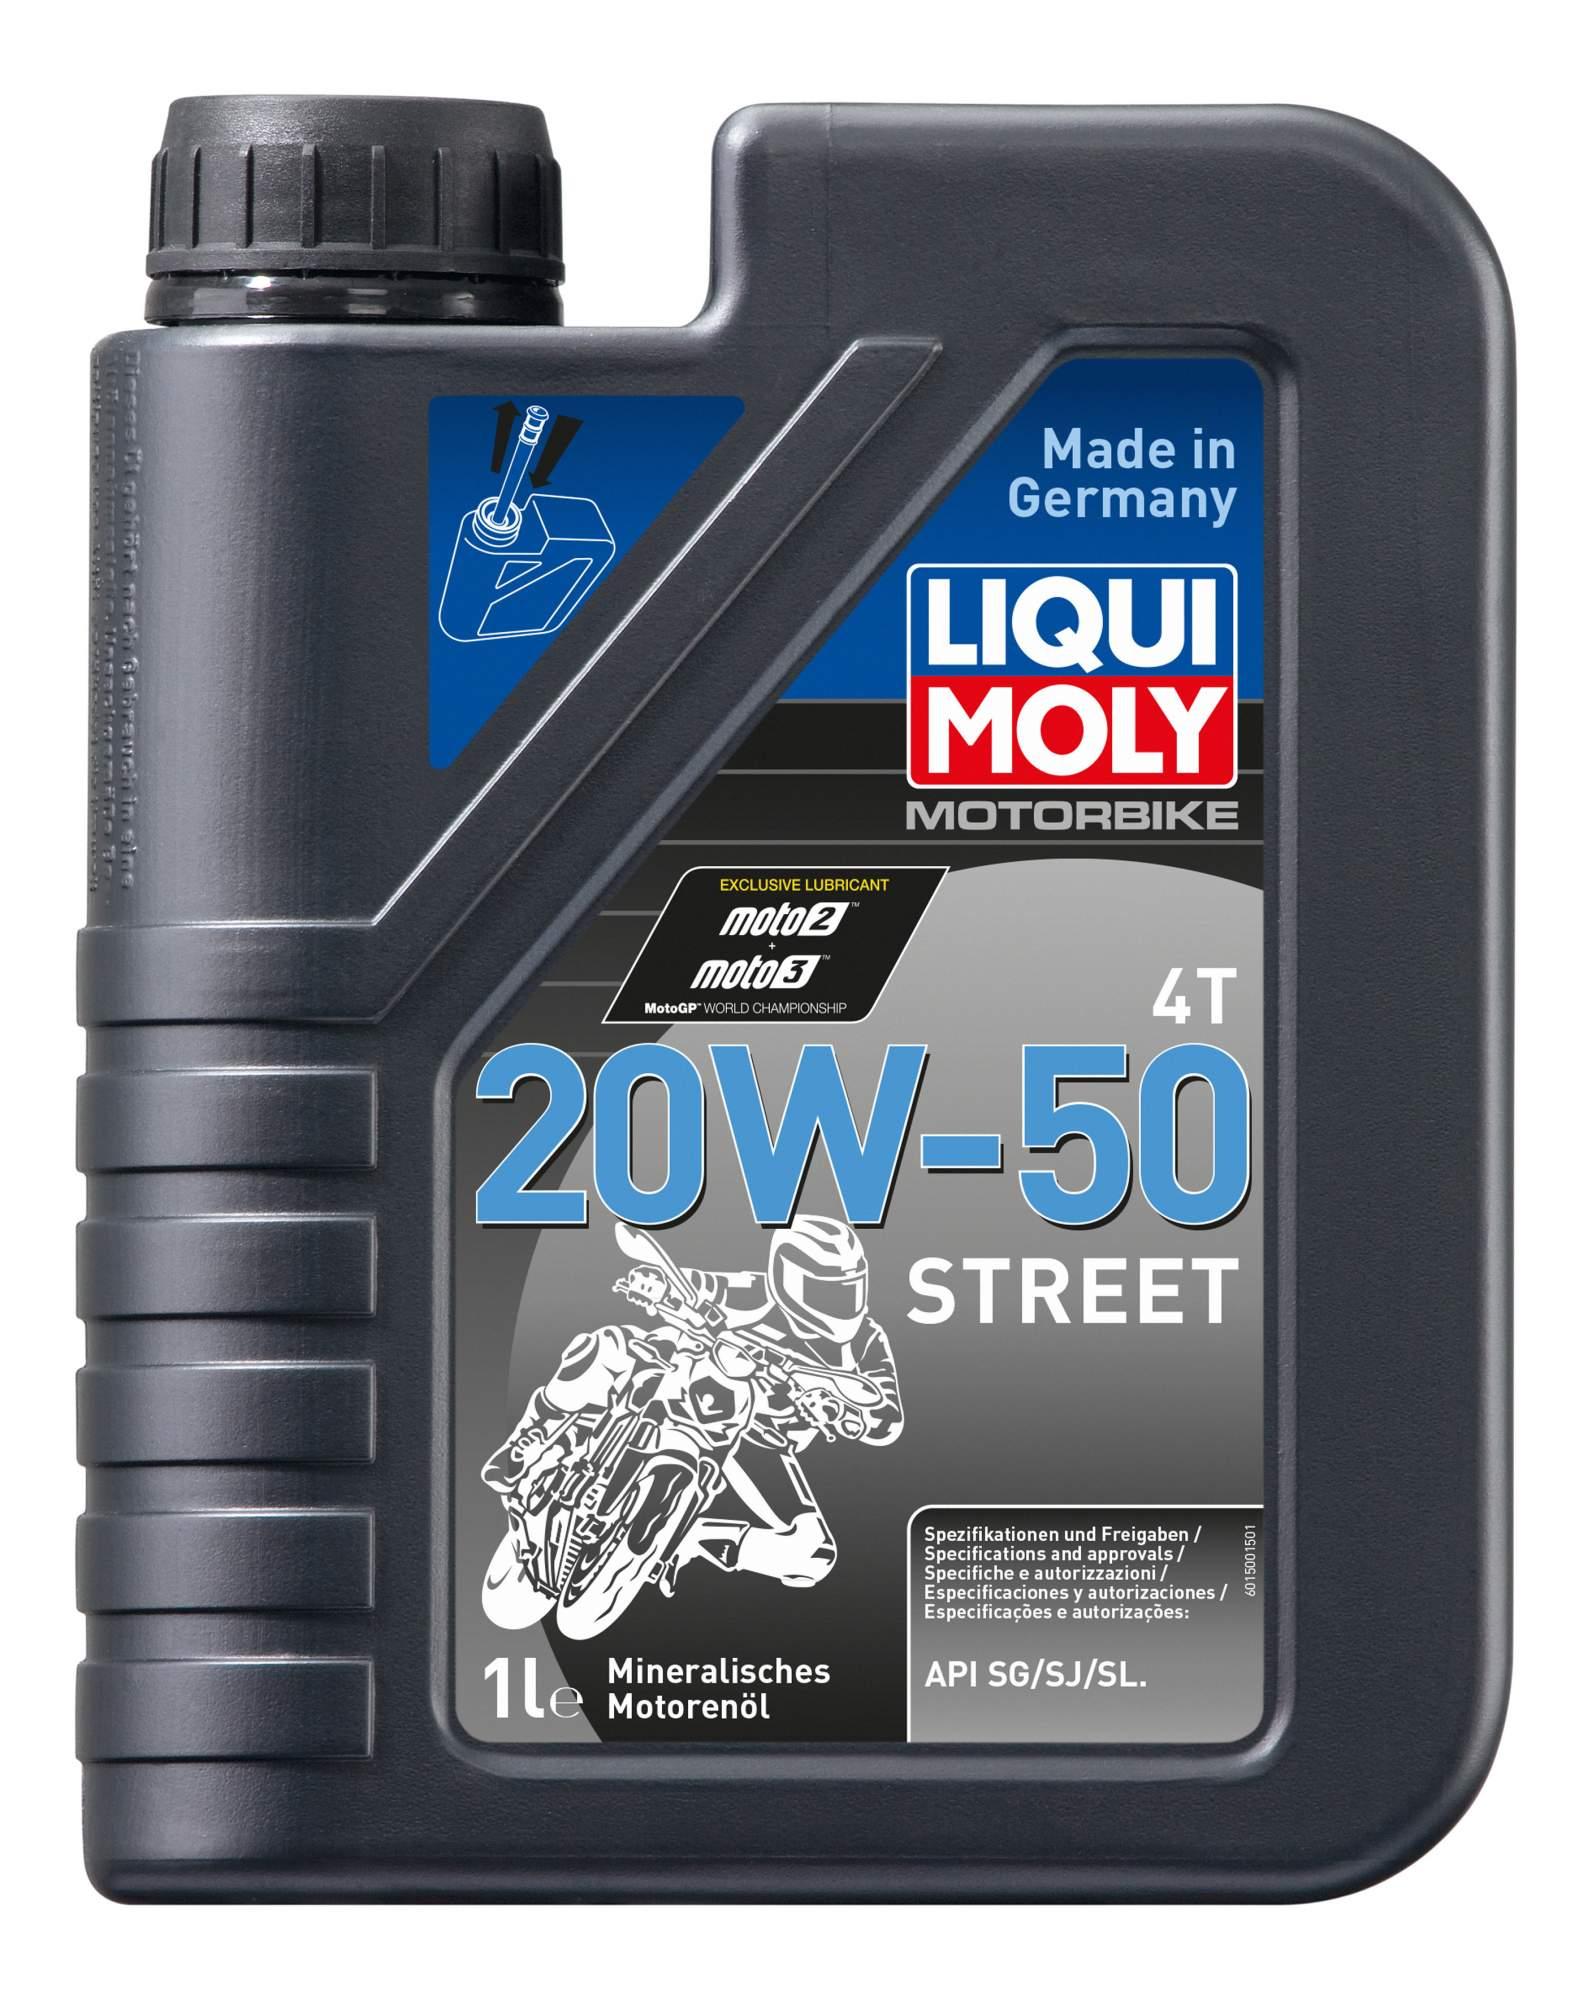 Моторное масло Liqui moly Motorbike 4T Street 20W-50 1л